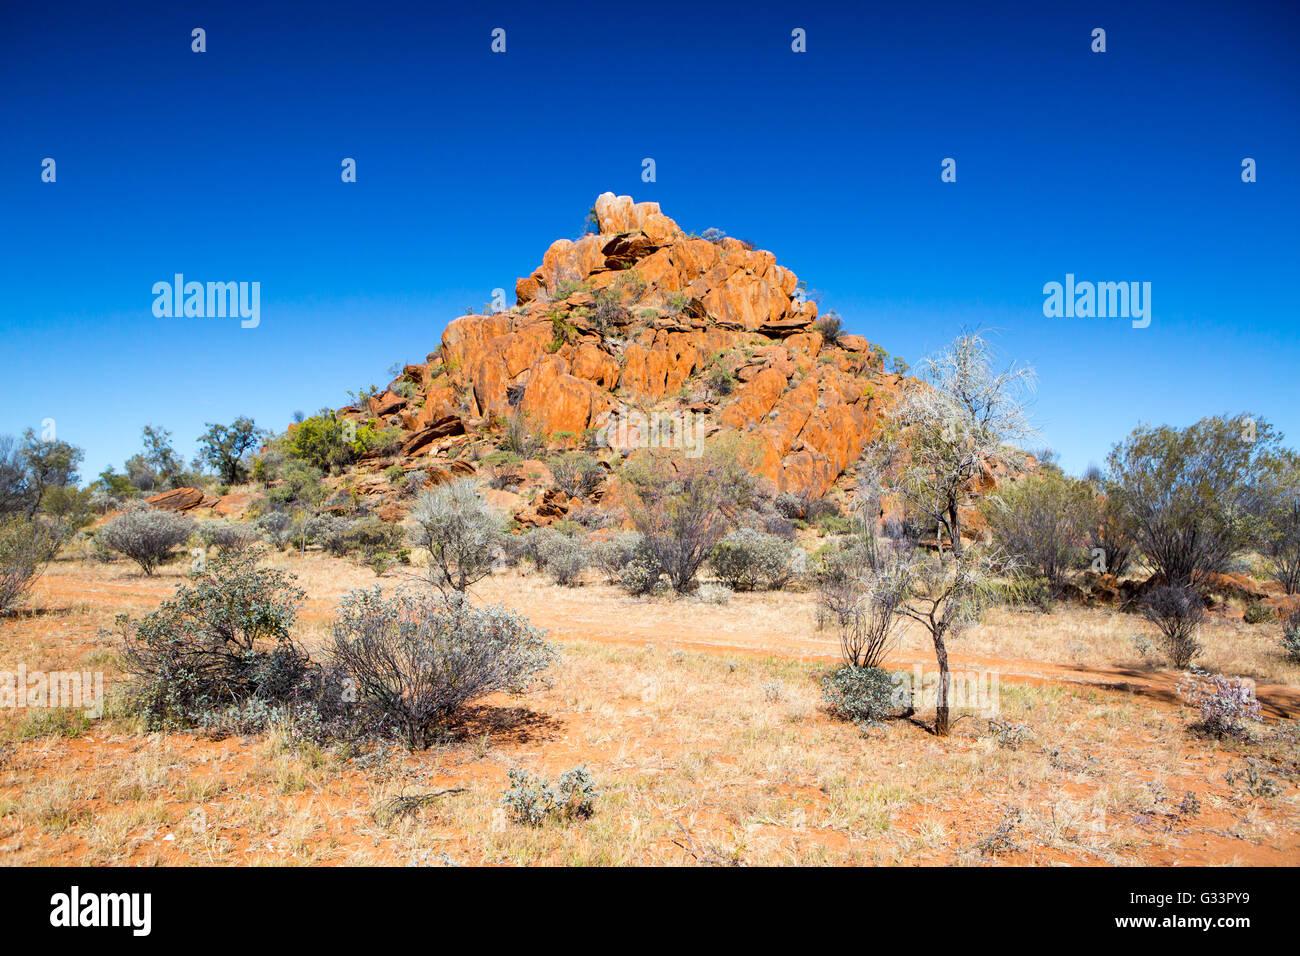 Gem fields near Gemtree in the Northern Territory, Australia - Stock Image